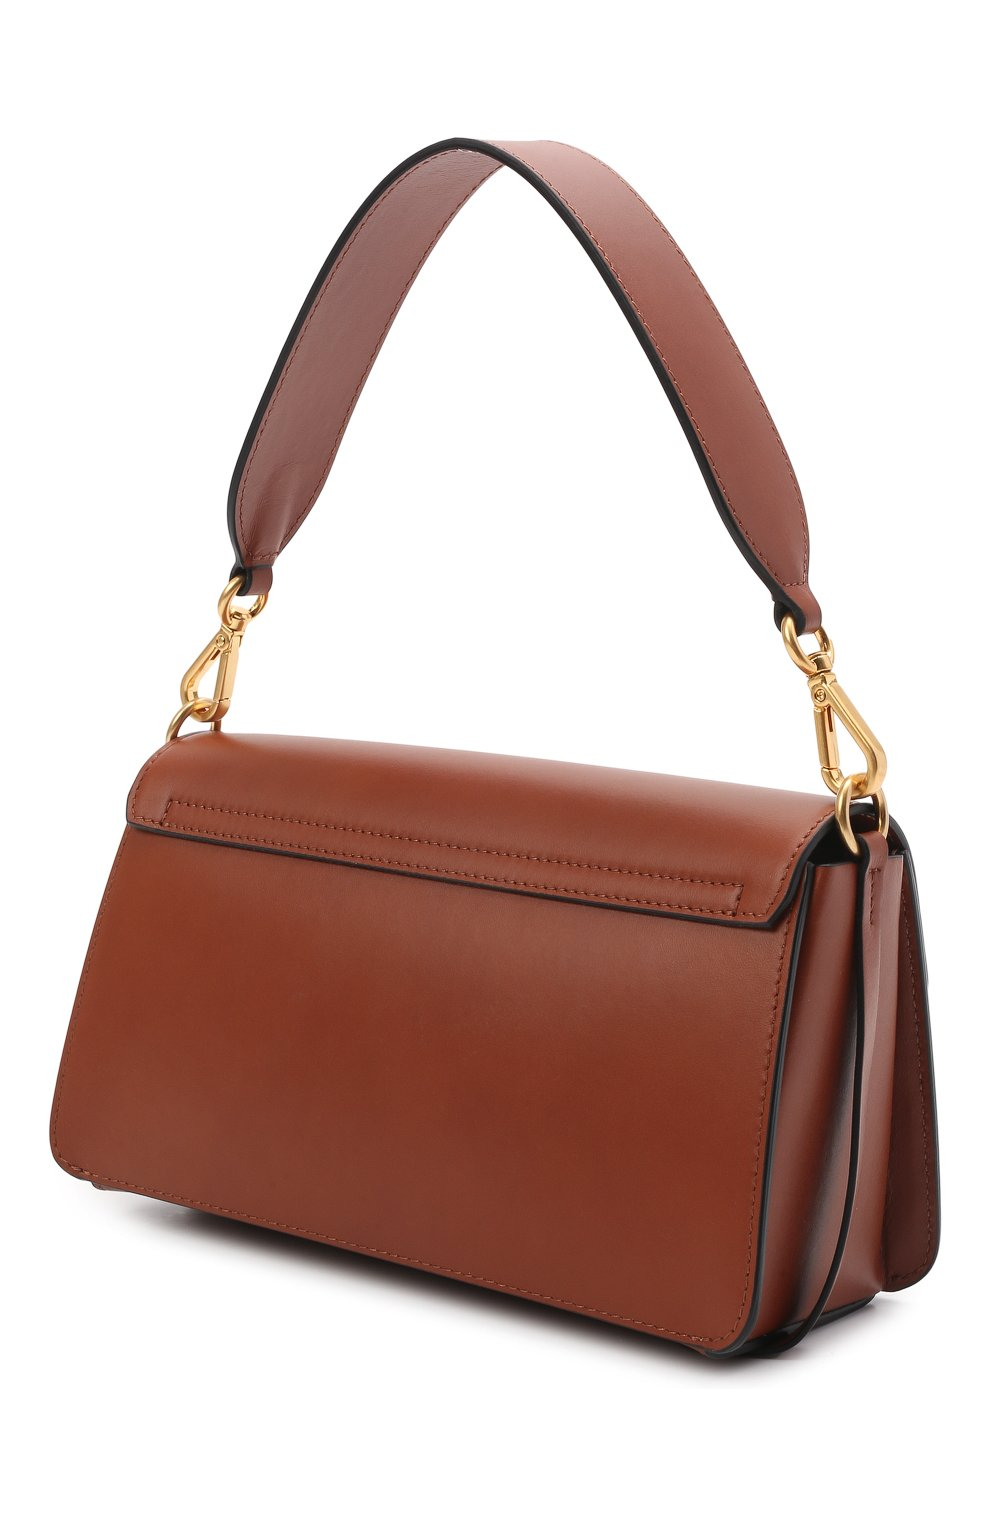 Женская сумка georgia WANDLER коричневого цвета, арт. GE0RGIA BAG   Фото 3 (Сумки-технические: Сумки через плечо, Сумки top-handle; Материал: Натуральная кожа; Размер: small)